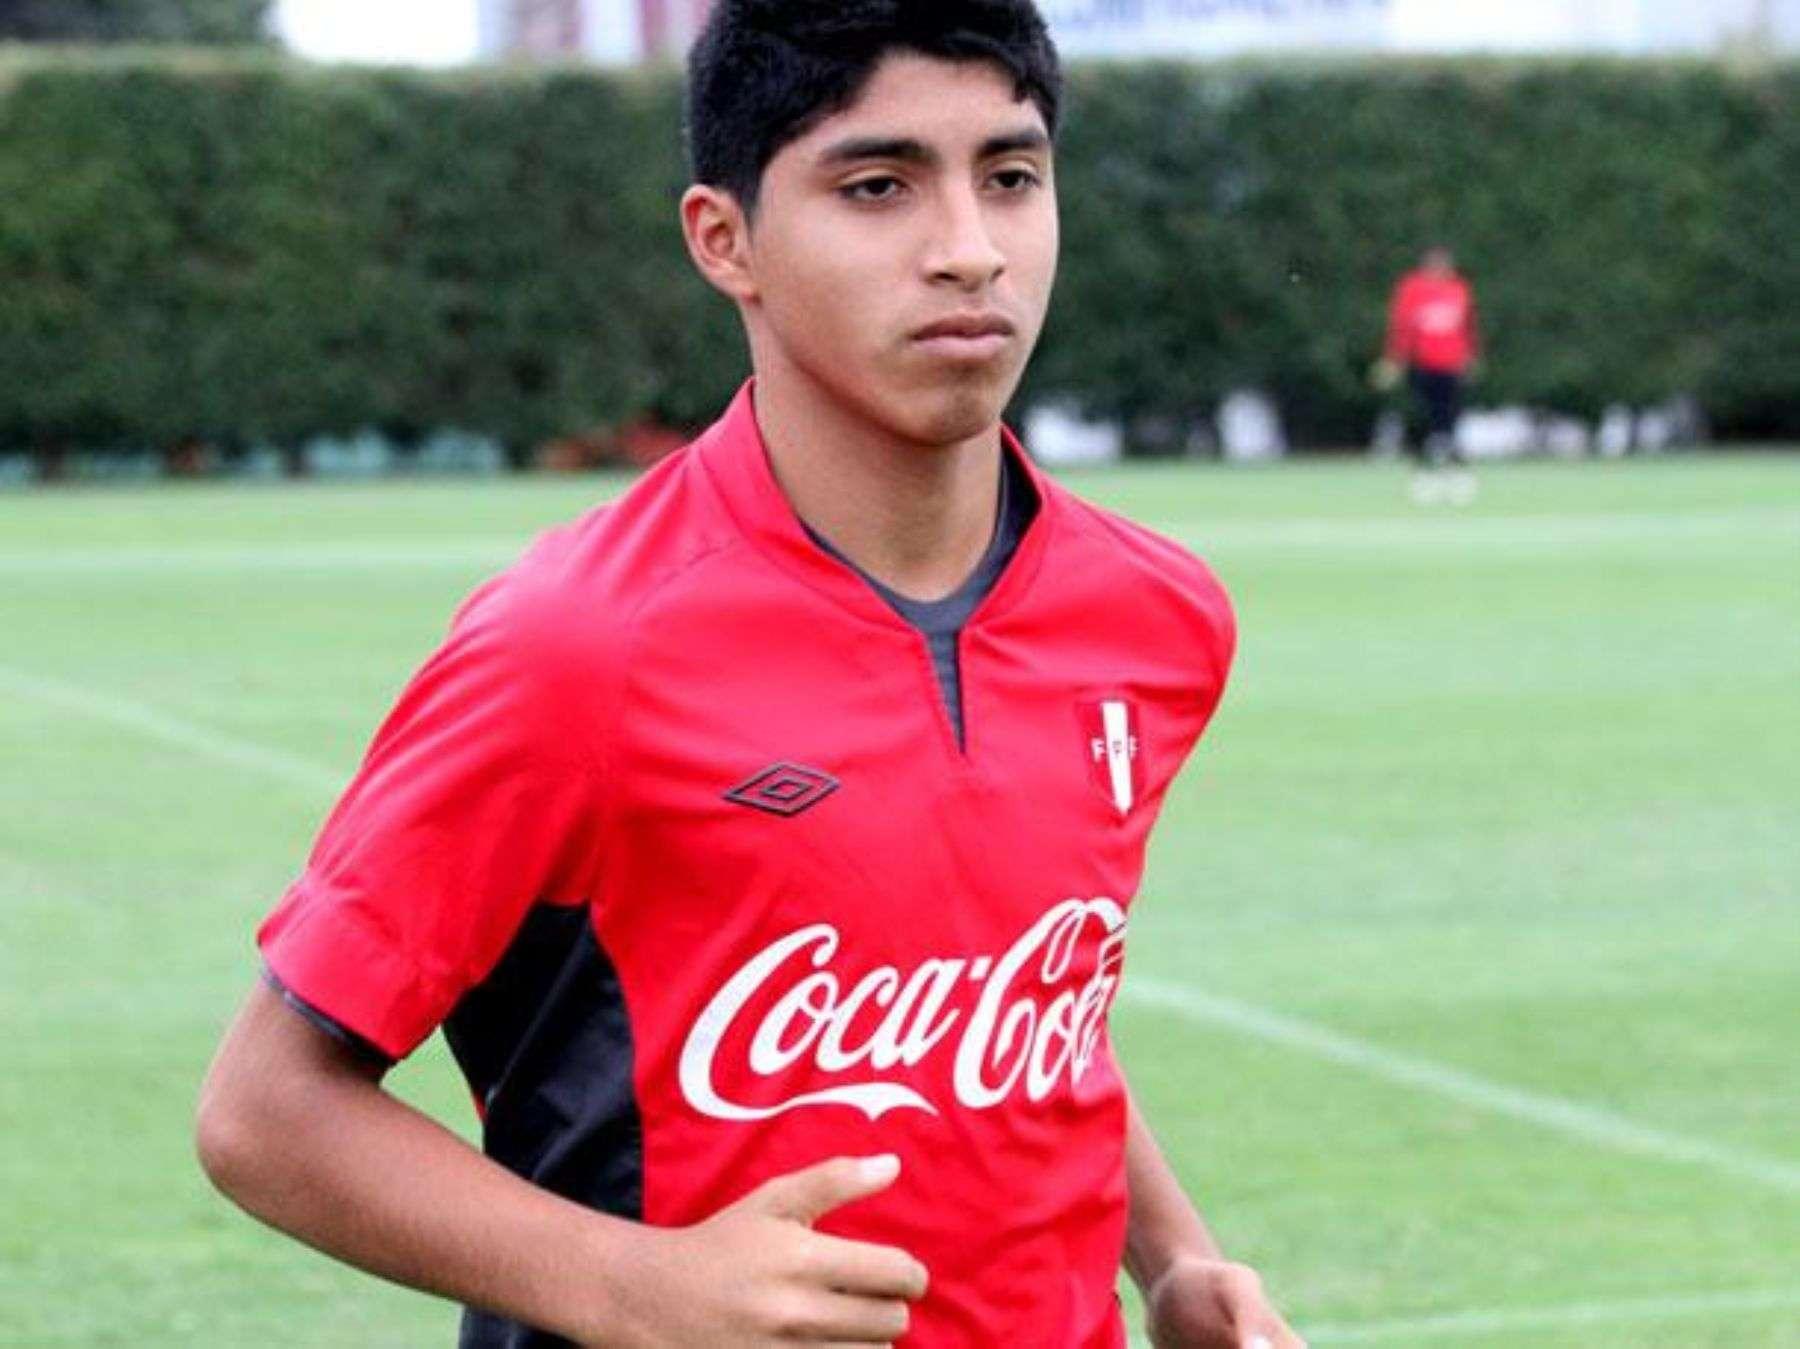 Luis Iberico anotó siete goles en el Sudamericano Sub-15 del 2013, que Perú ganó Foto: Andina